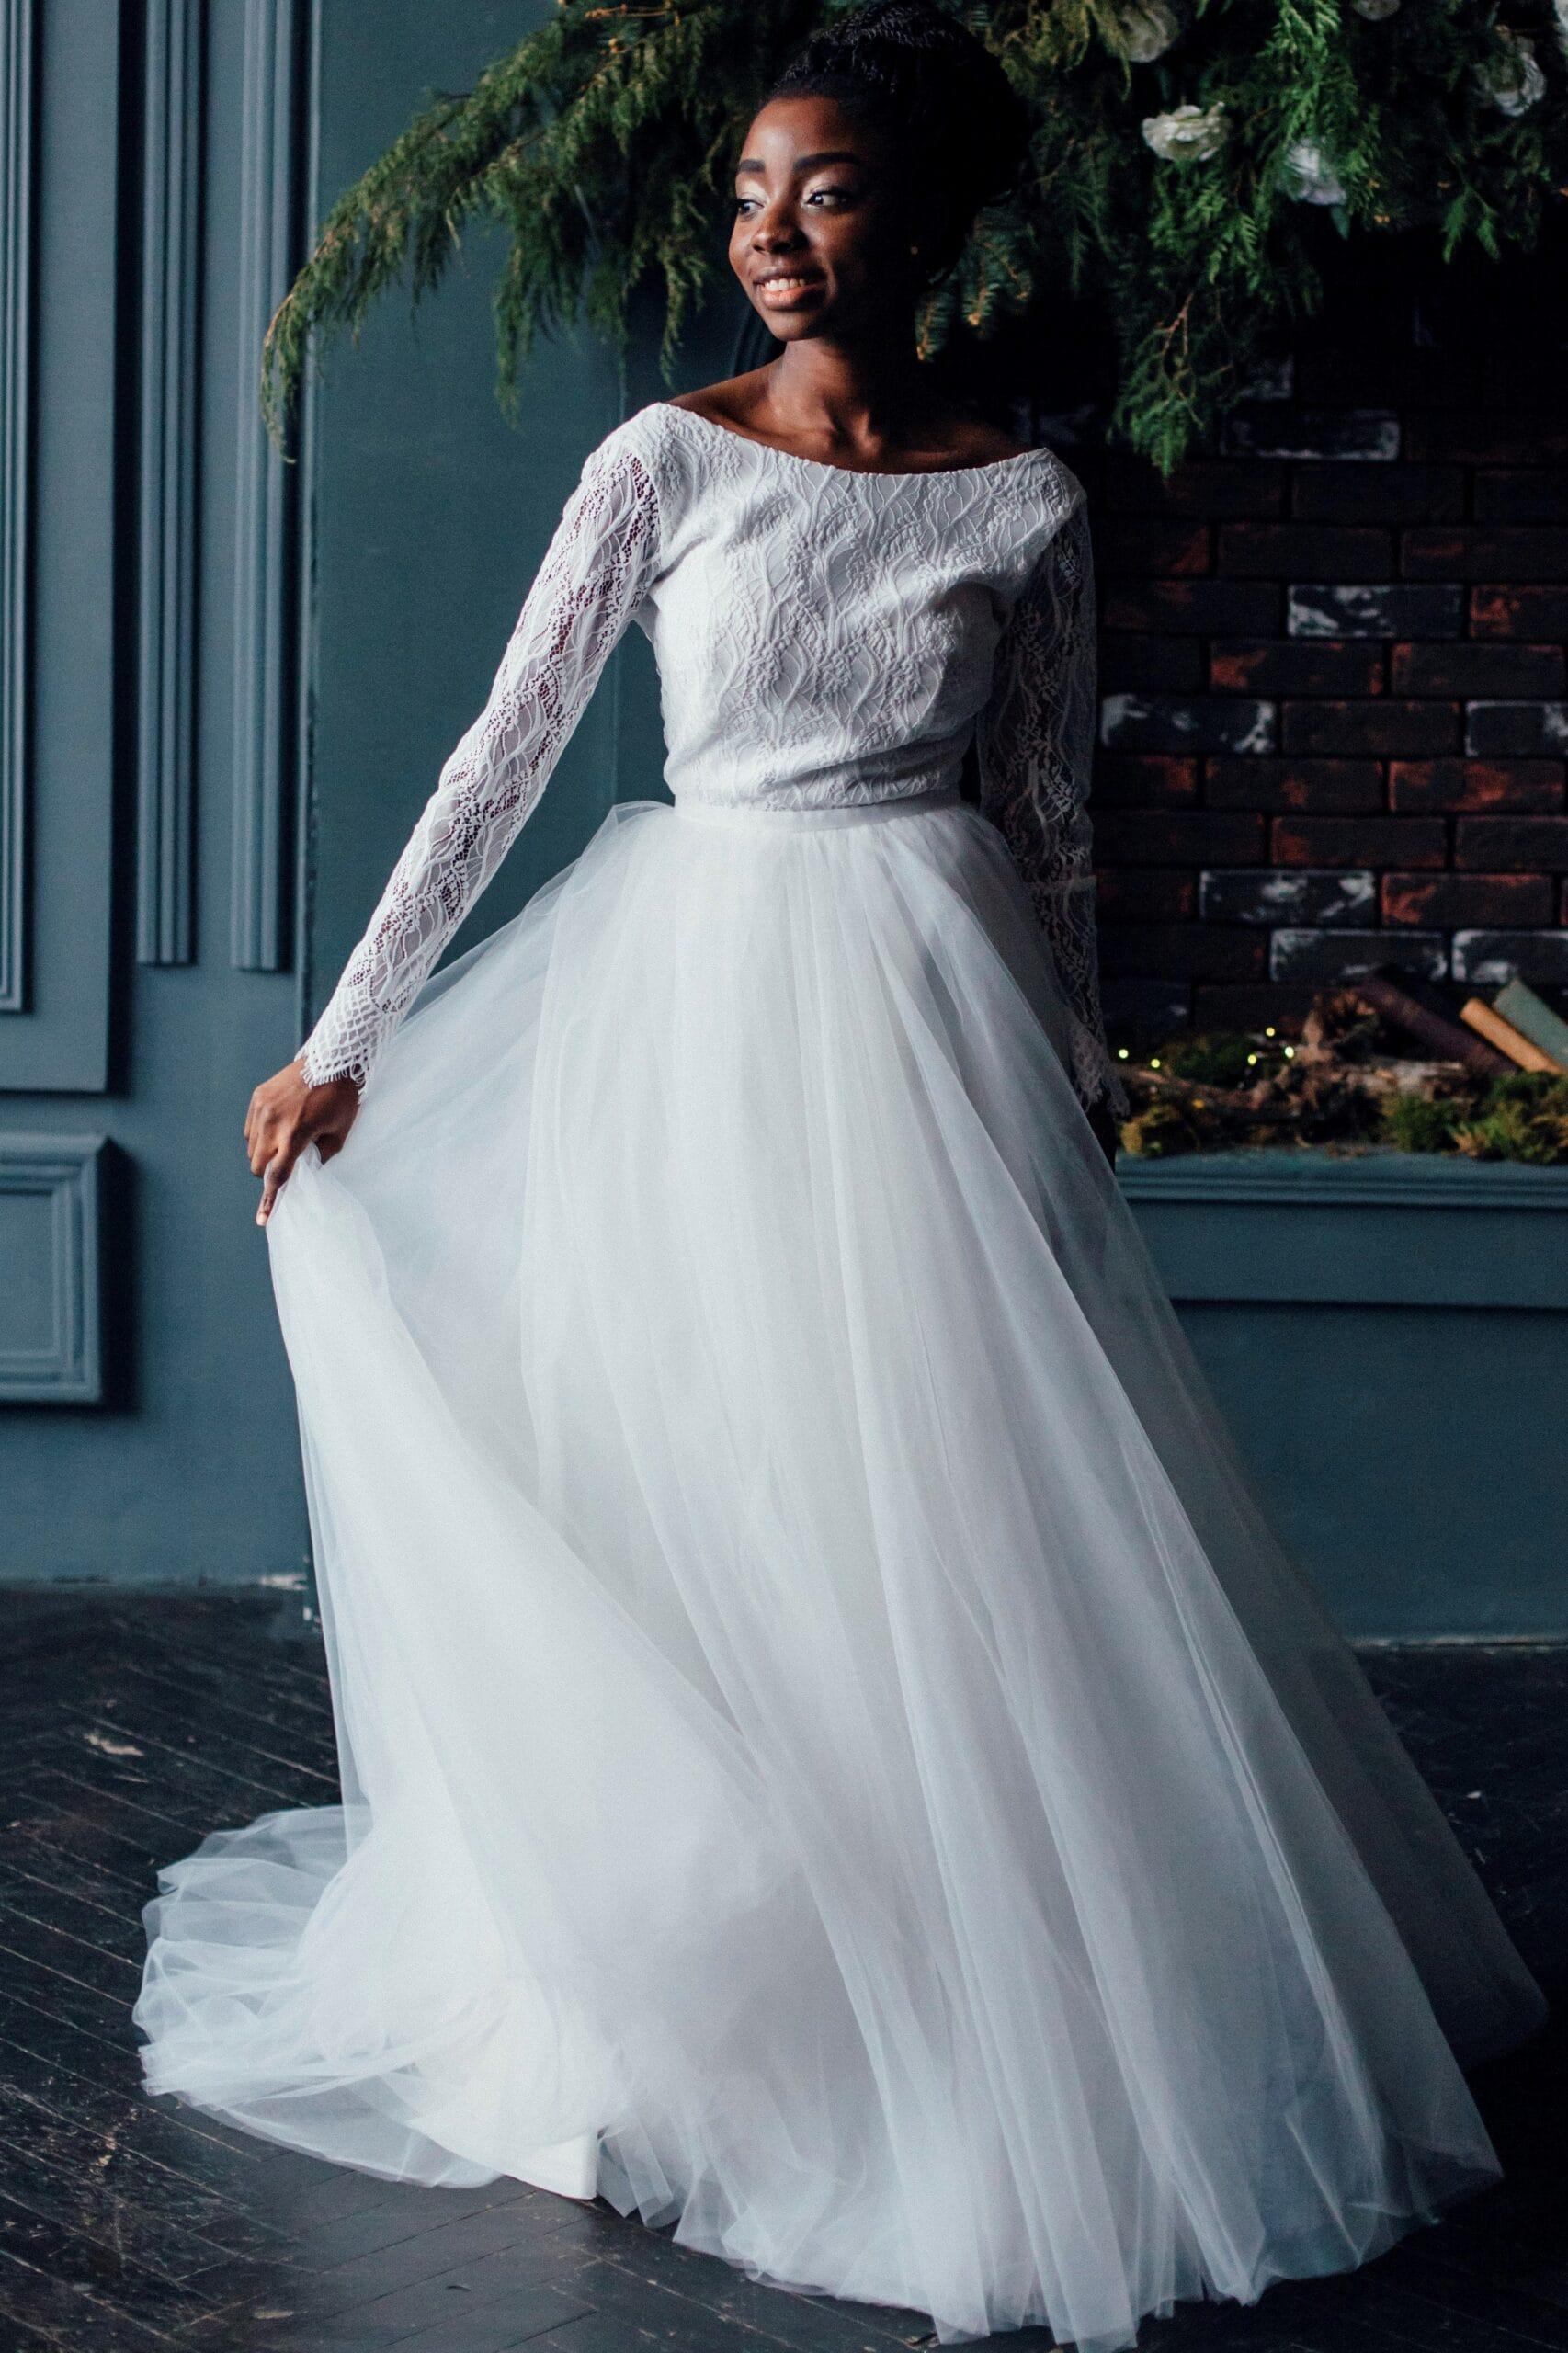 Свадебное платье JESSICA, коллекция THE ABSOLUTE LOVE, бренд RARE BRIDAL, фото 3